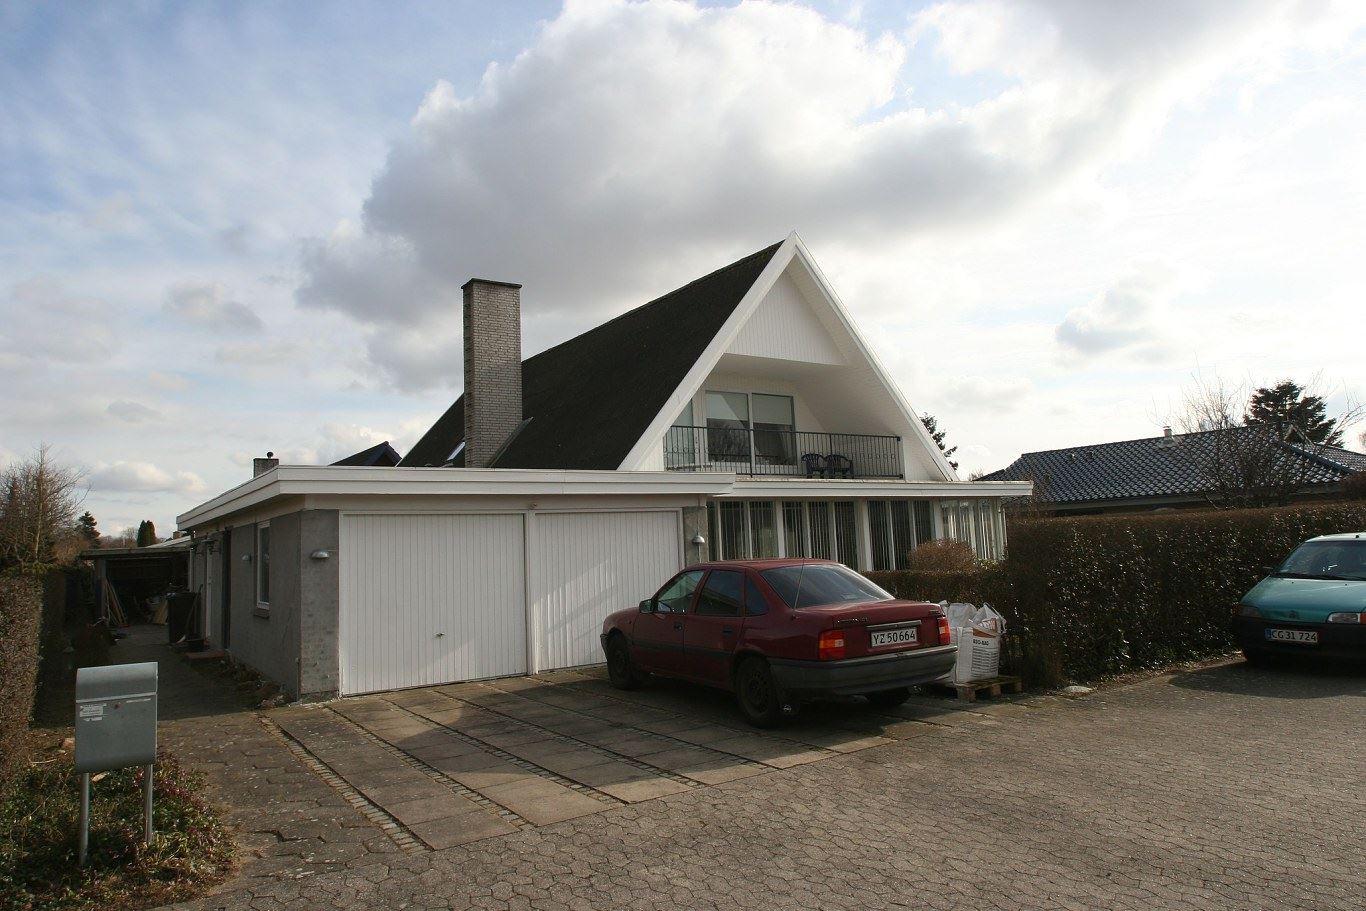 Sørby Parkvej 68, Sørbymagle, 4200 Slagelse